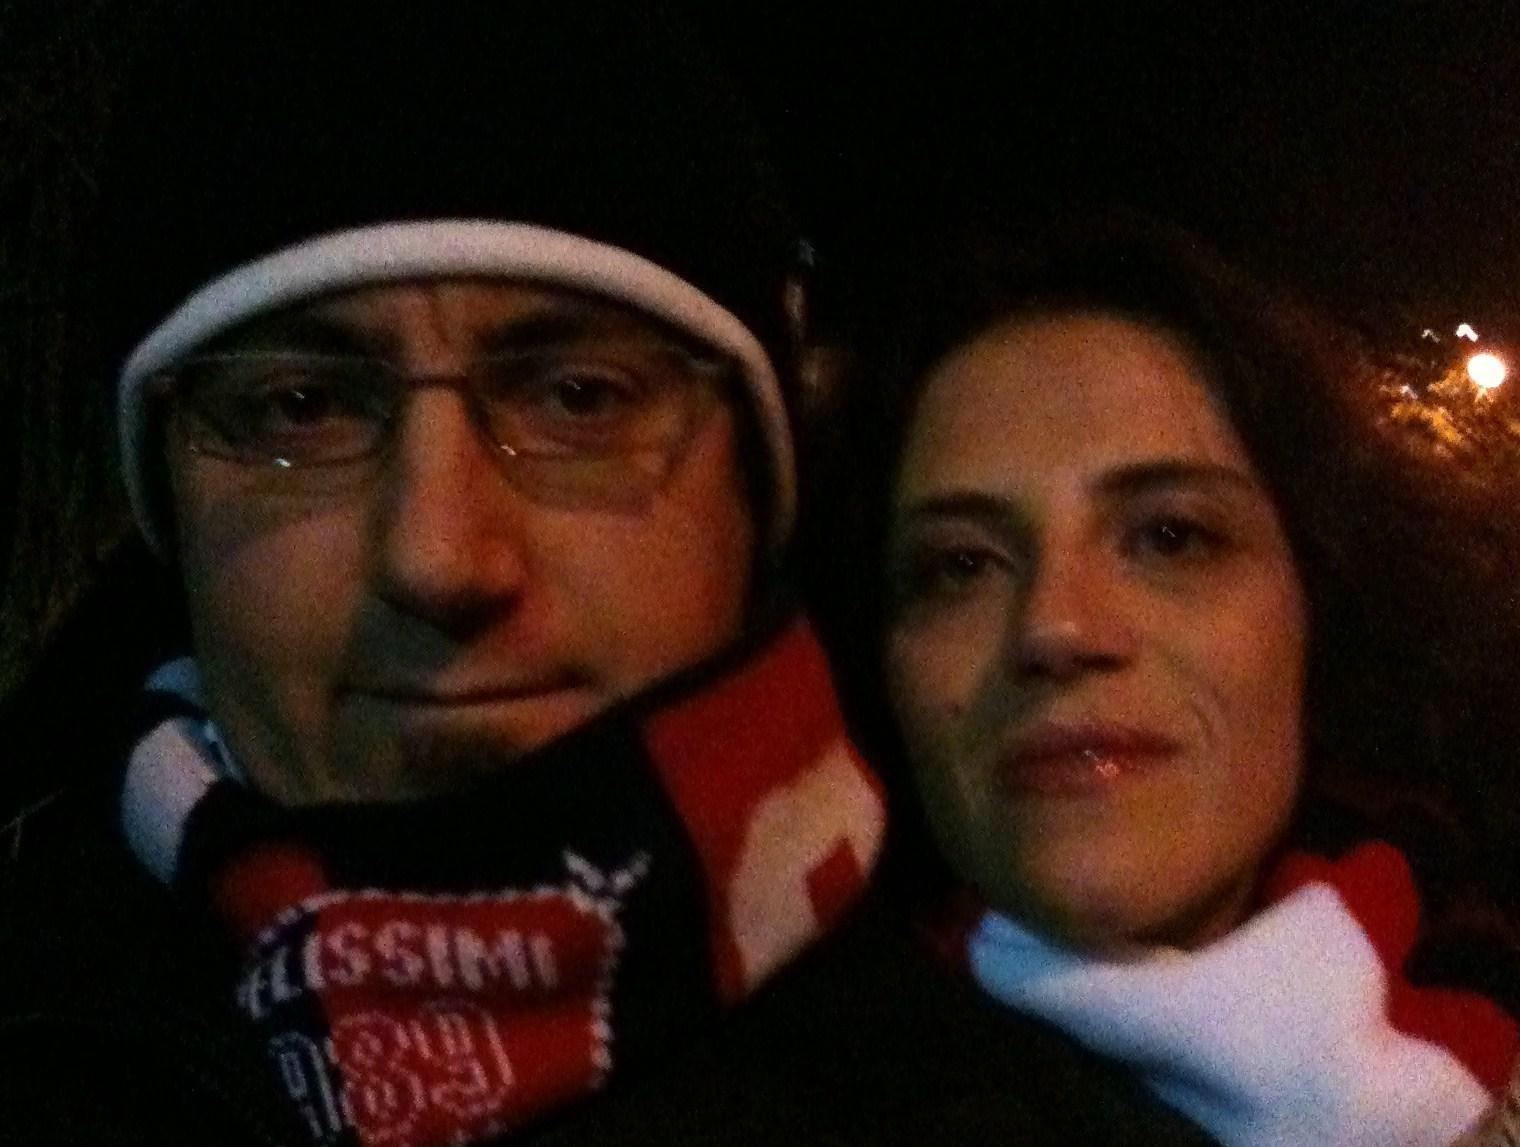 Danilo De Angelis e Chiara Piunti